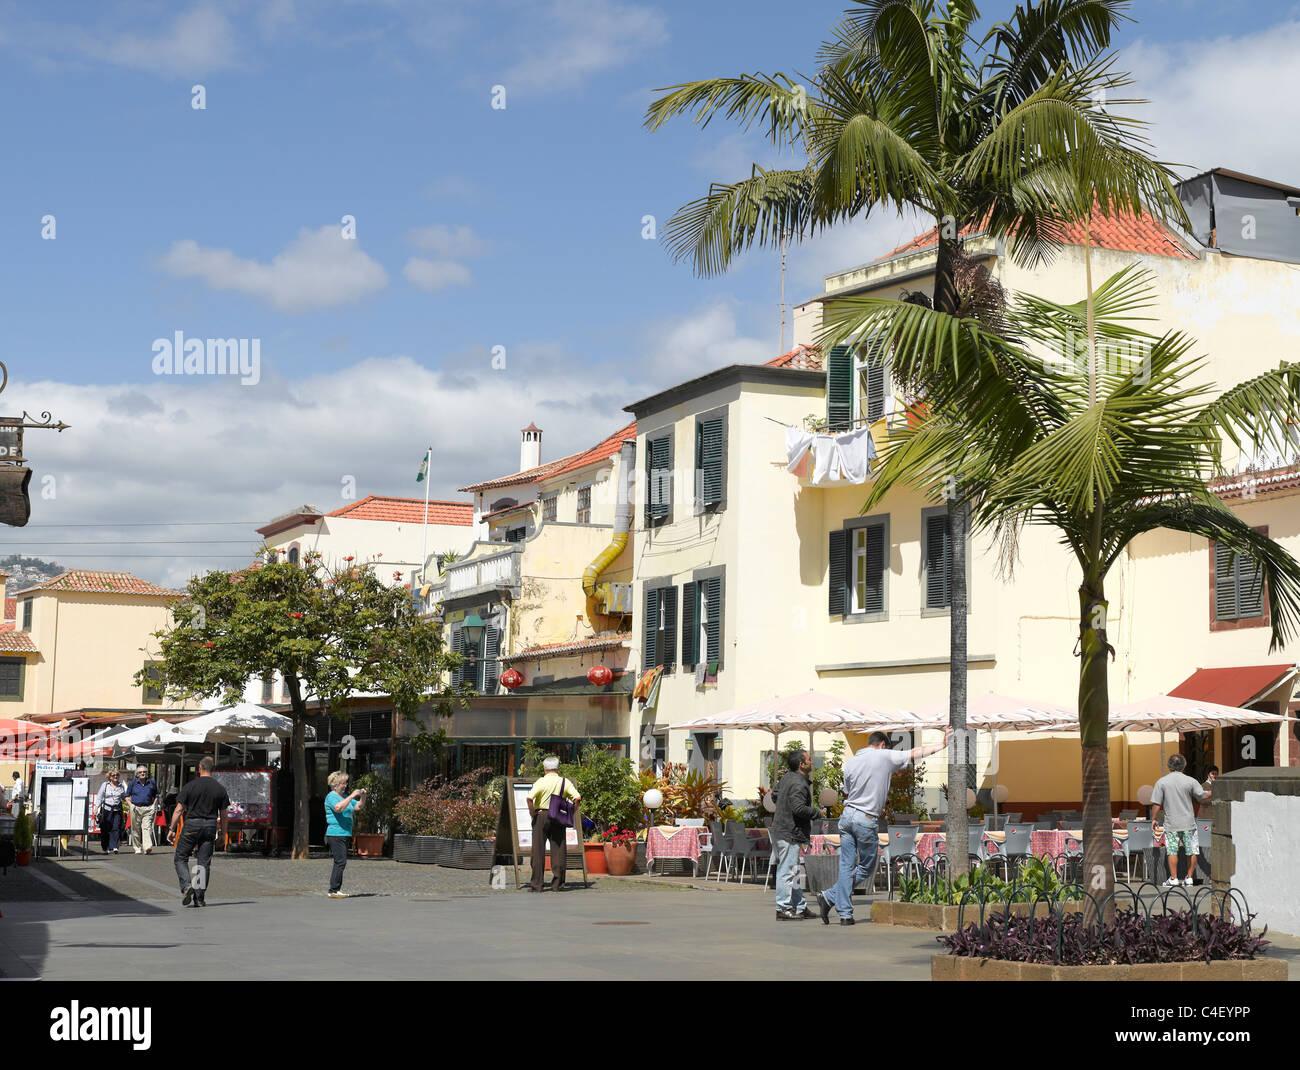 Zona Velha Old Town Funchal Madeira Portugal EU Europe Stock Photo